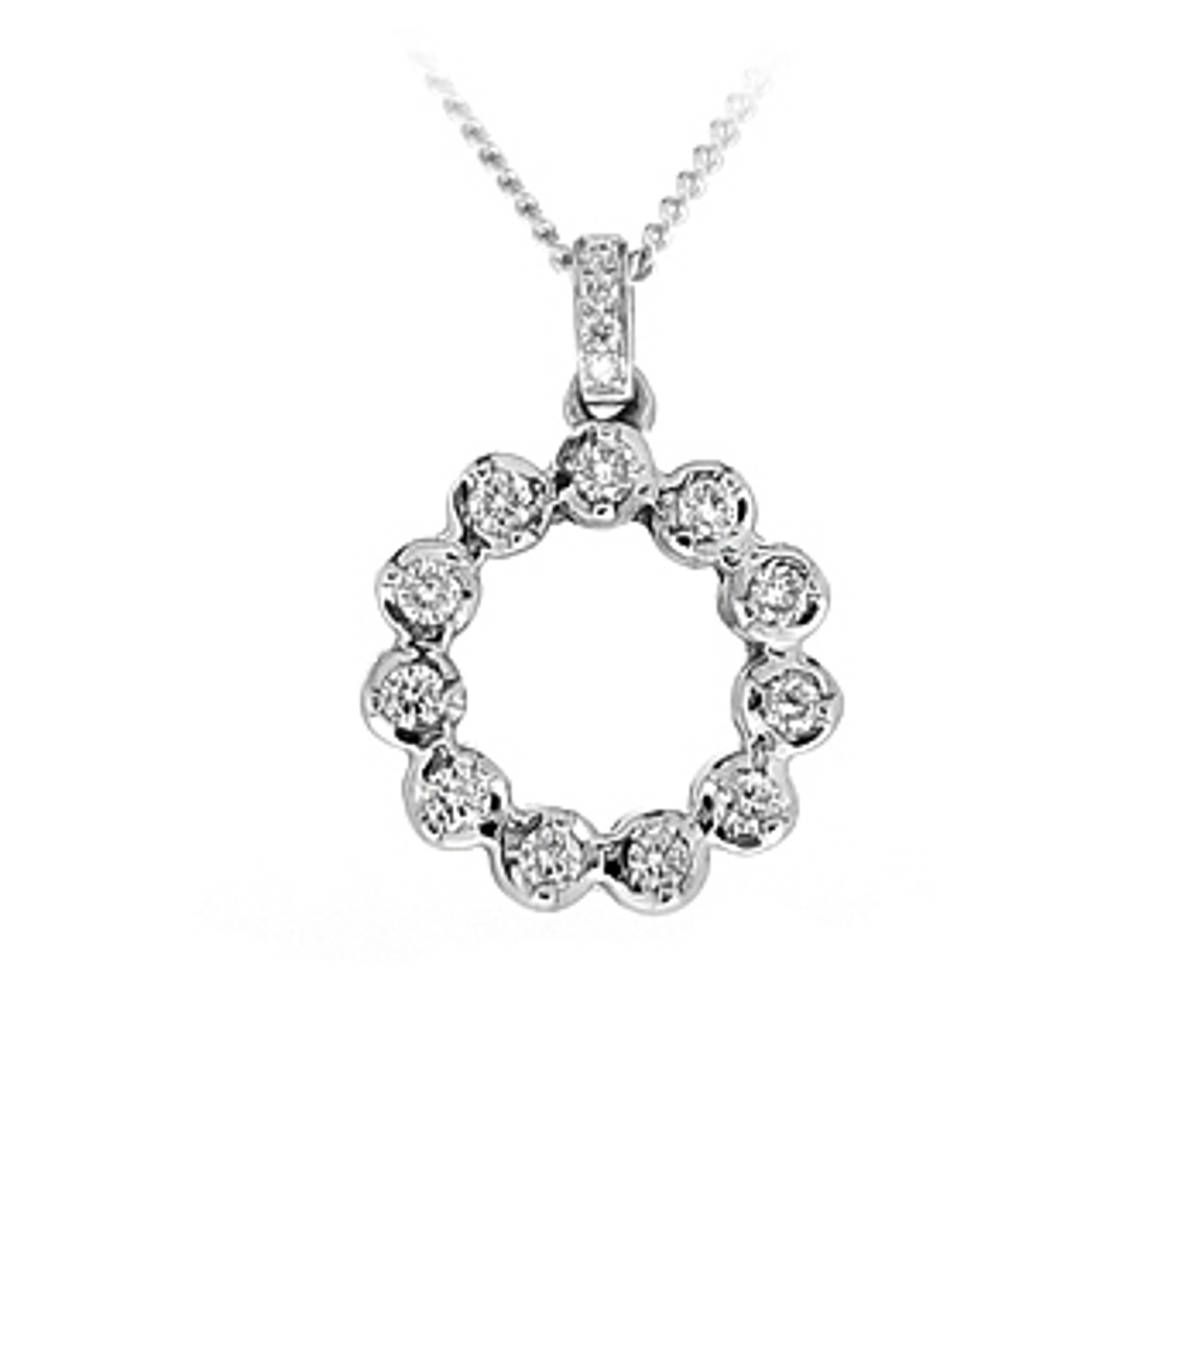 "18k White Gold Brilliant Cut Diamond Circle Pendant On 18k White Gold 18"" Chain Total Diamond Weight 0.44cts Cut: Brilliant cut Metal: 18k White Gold Pendant length 2.2cmPendant width 1.5cm"